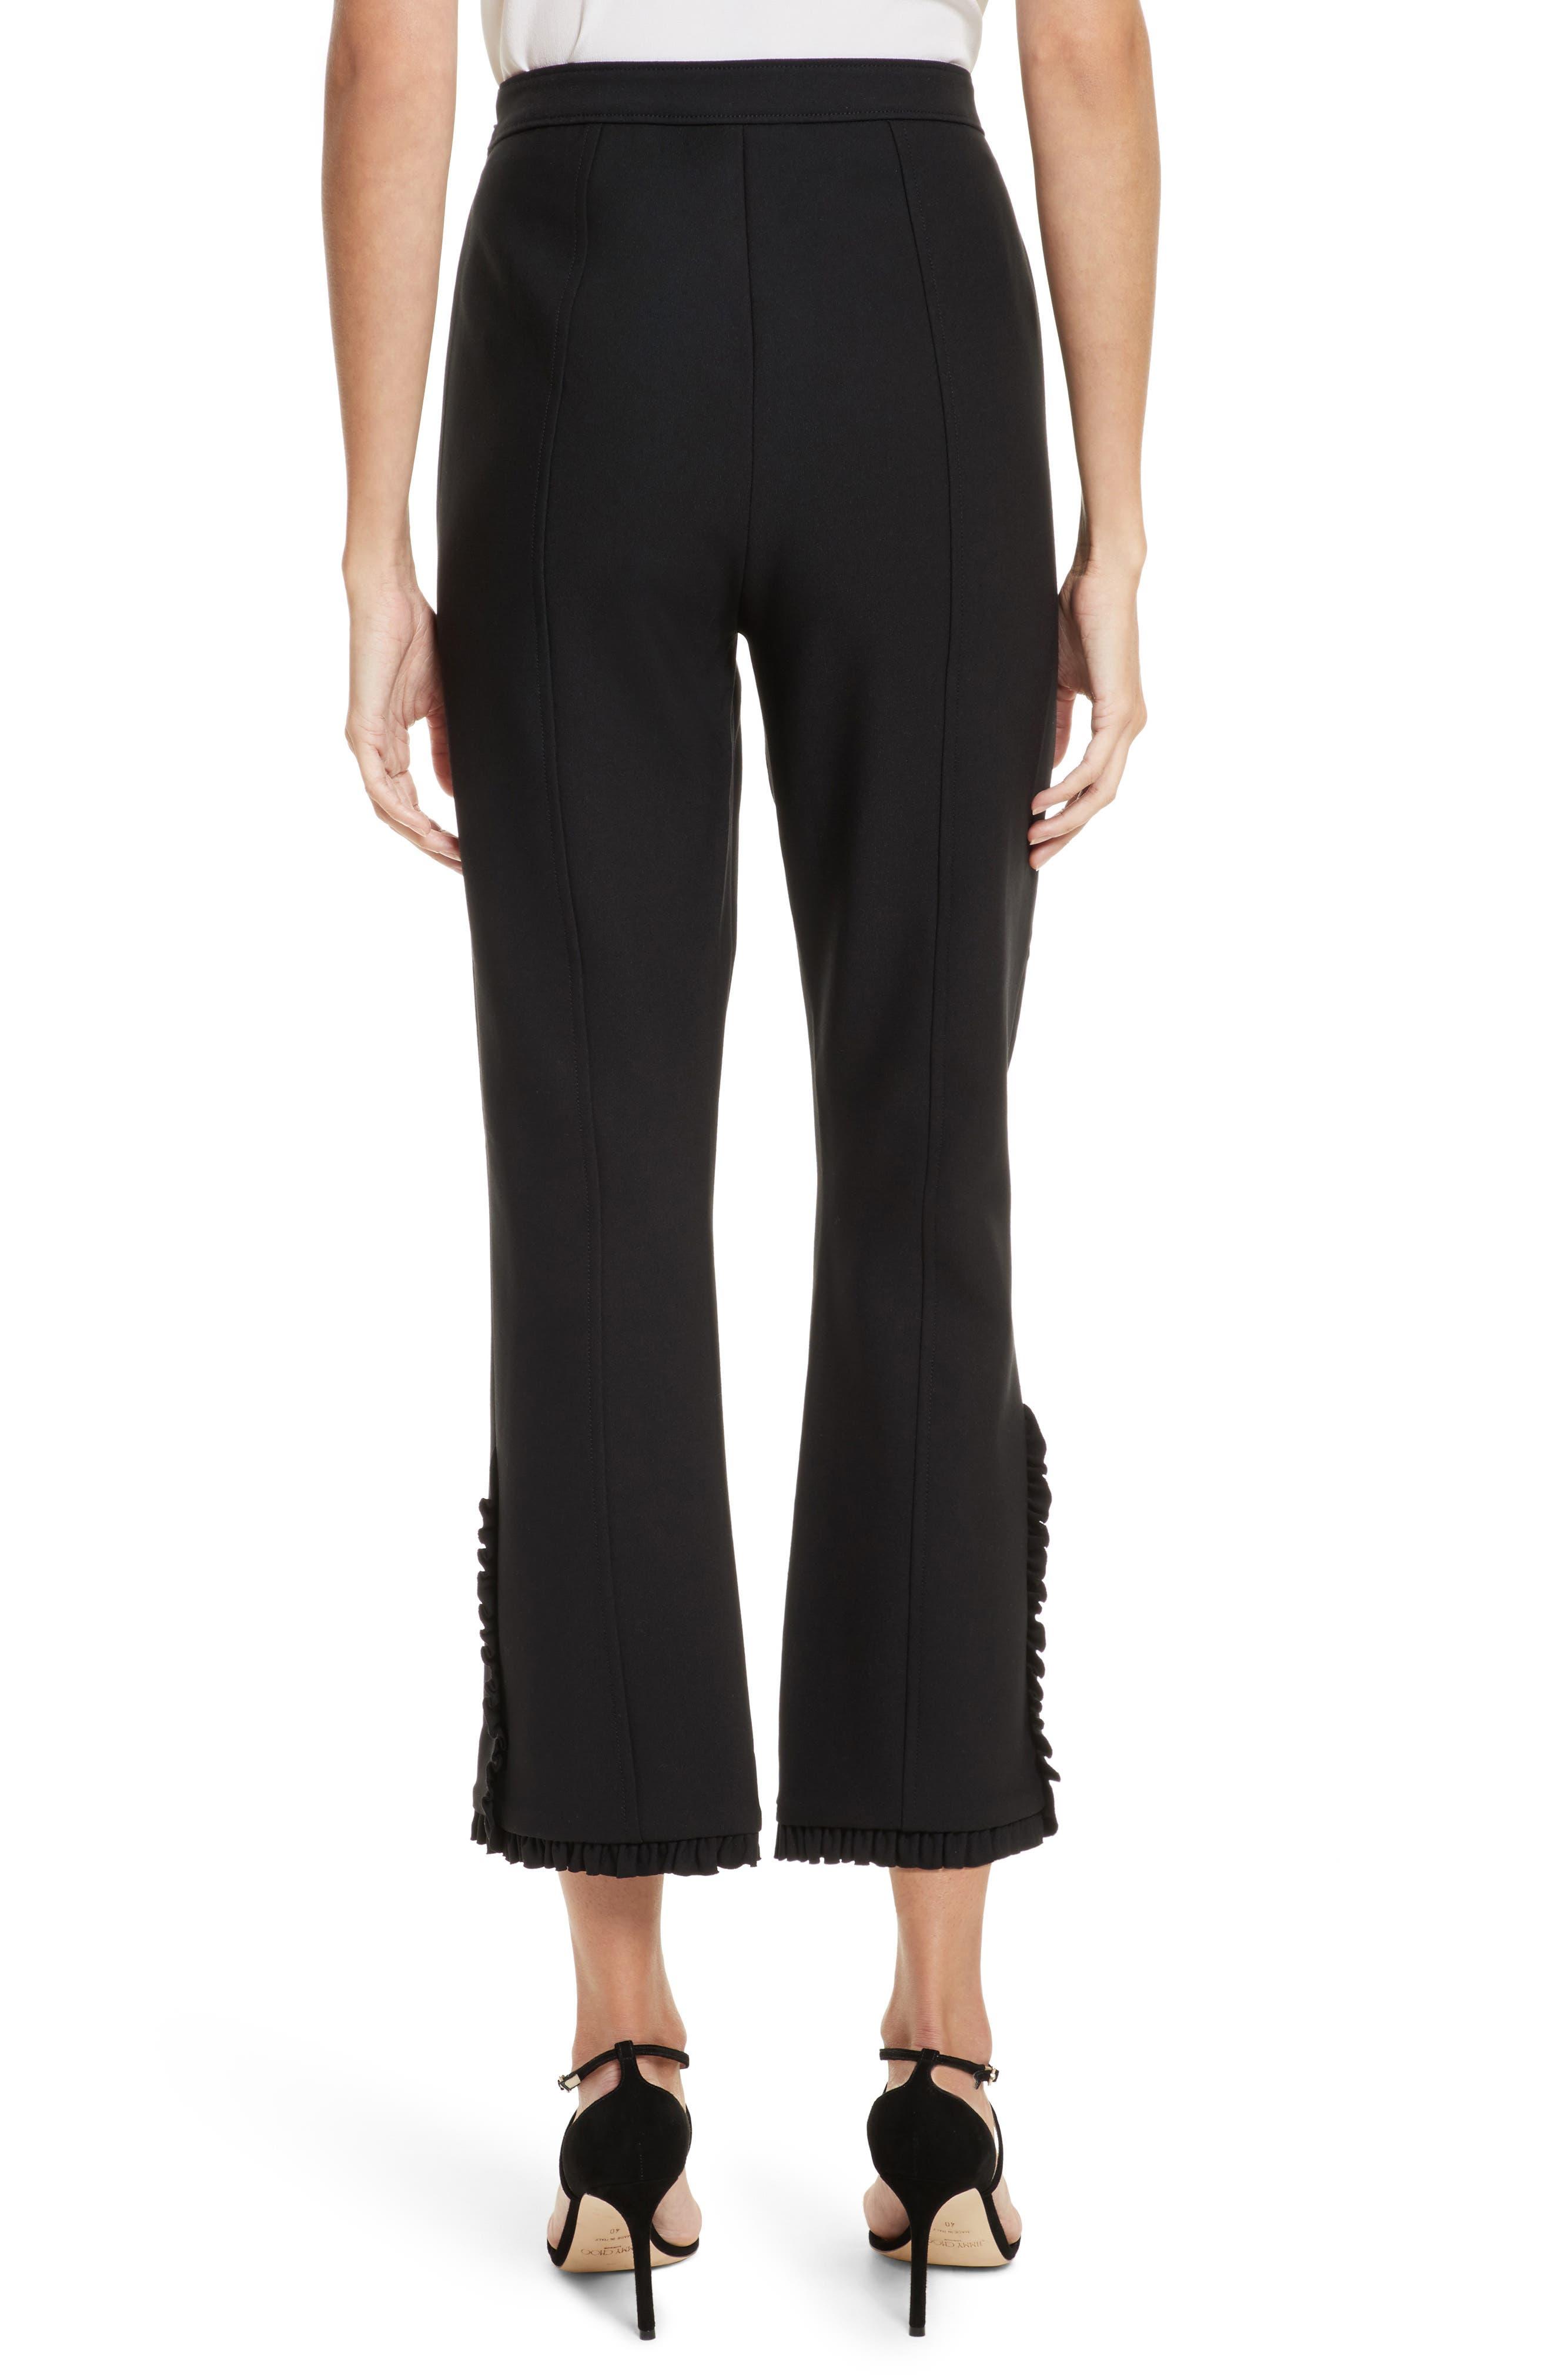 Seneca Flare Leg Crop Pants,                             Alternate thumbnail 2, color,                             Black